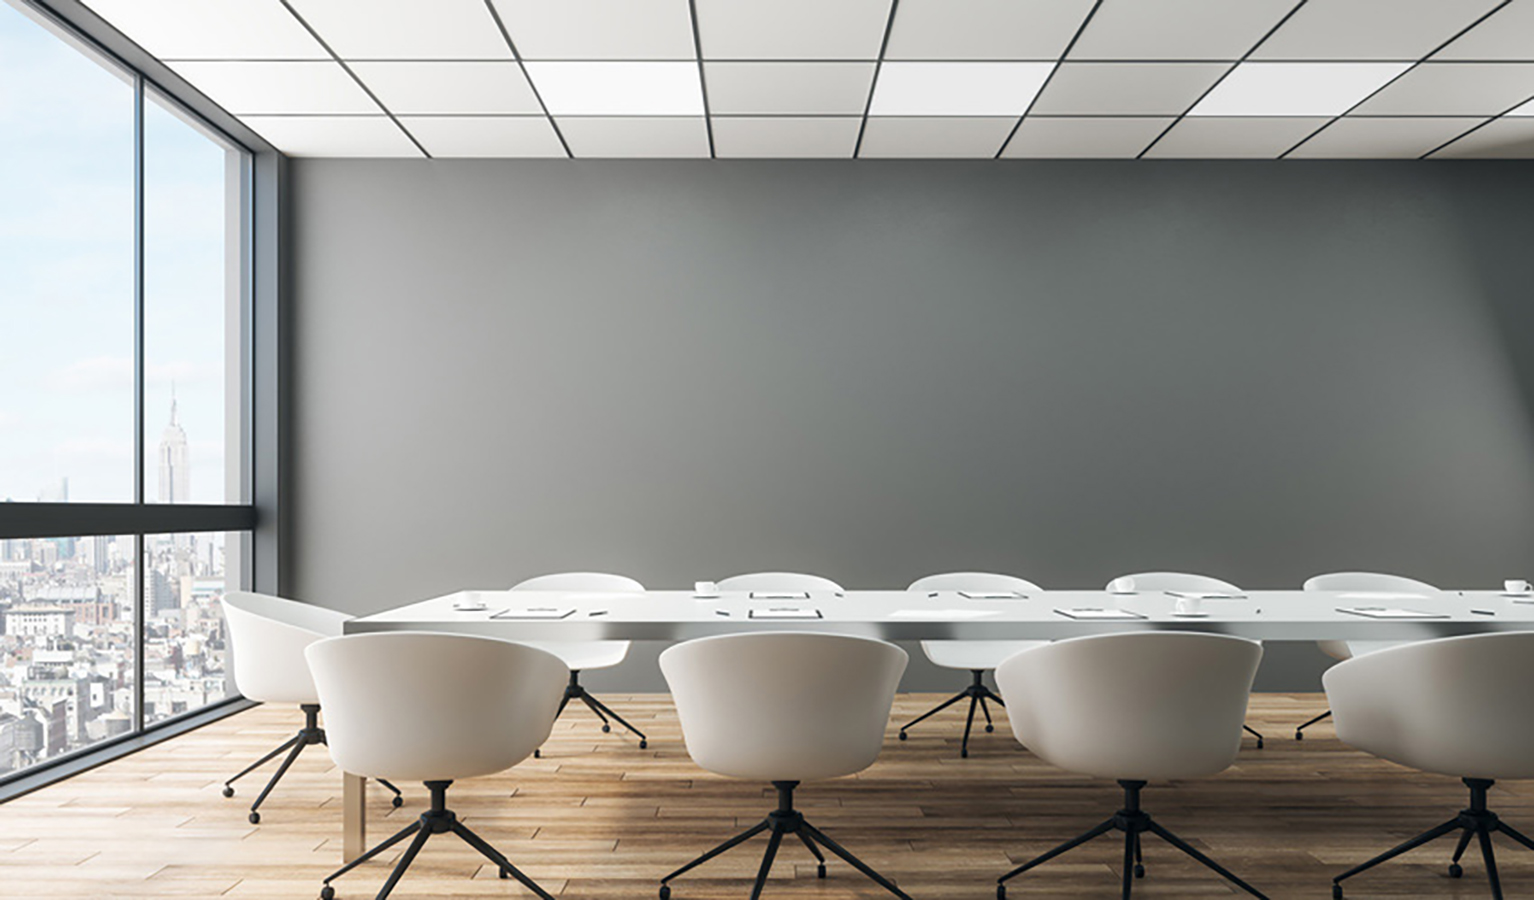 Infrared Ceiling Tile Heater For Suspended Ceilings Vasner